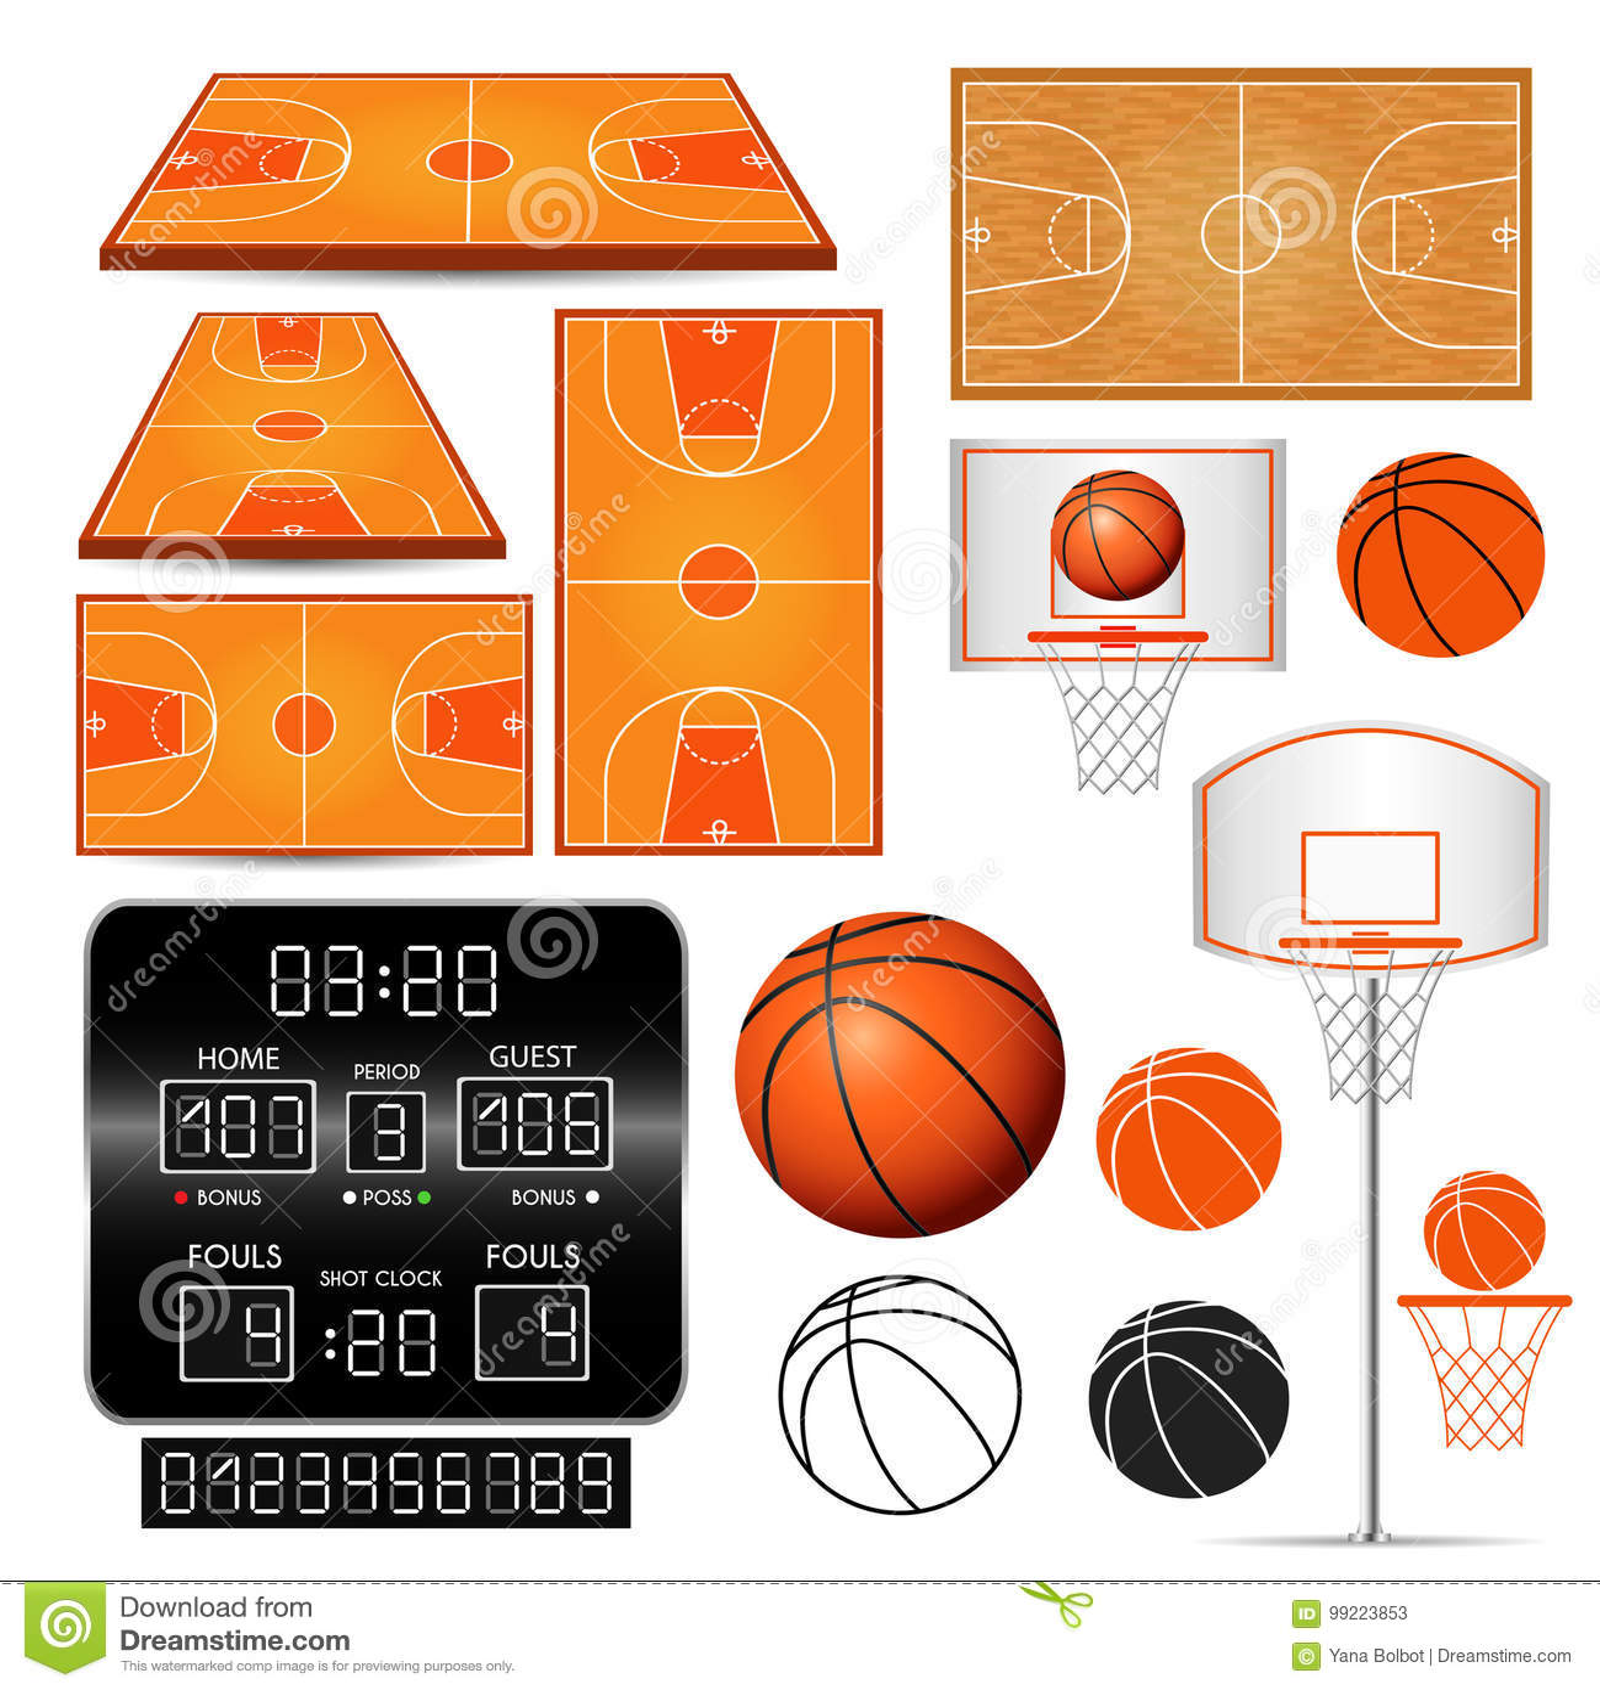 Basketkorg, beslag, boll, funktionskort med nummer, fält på vit bakgrund